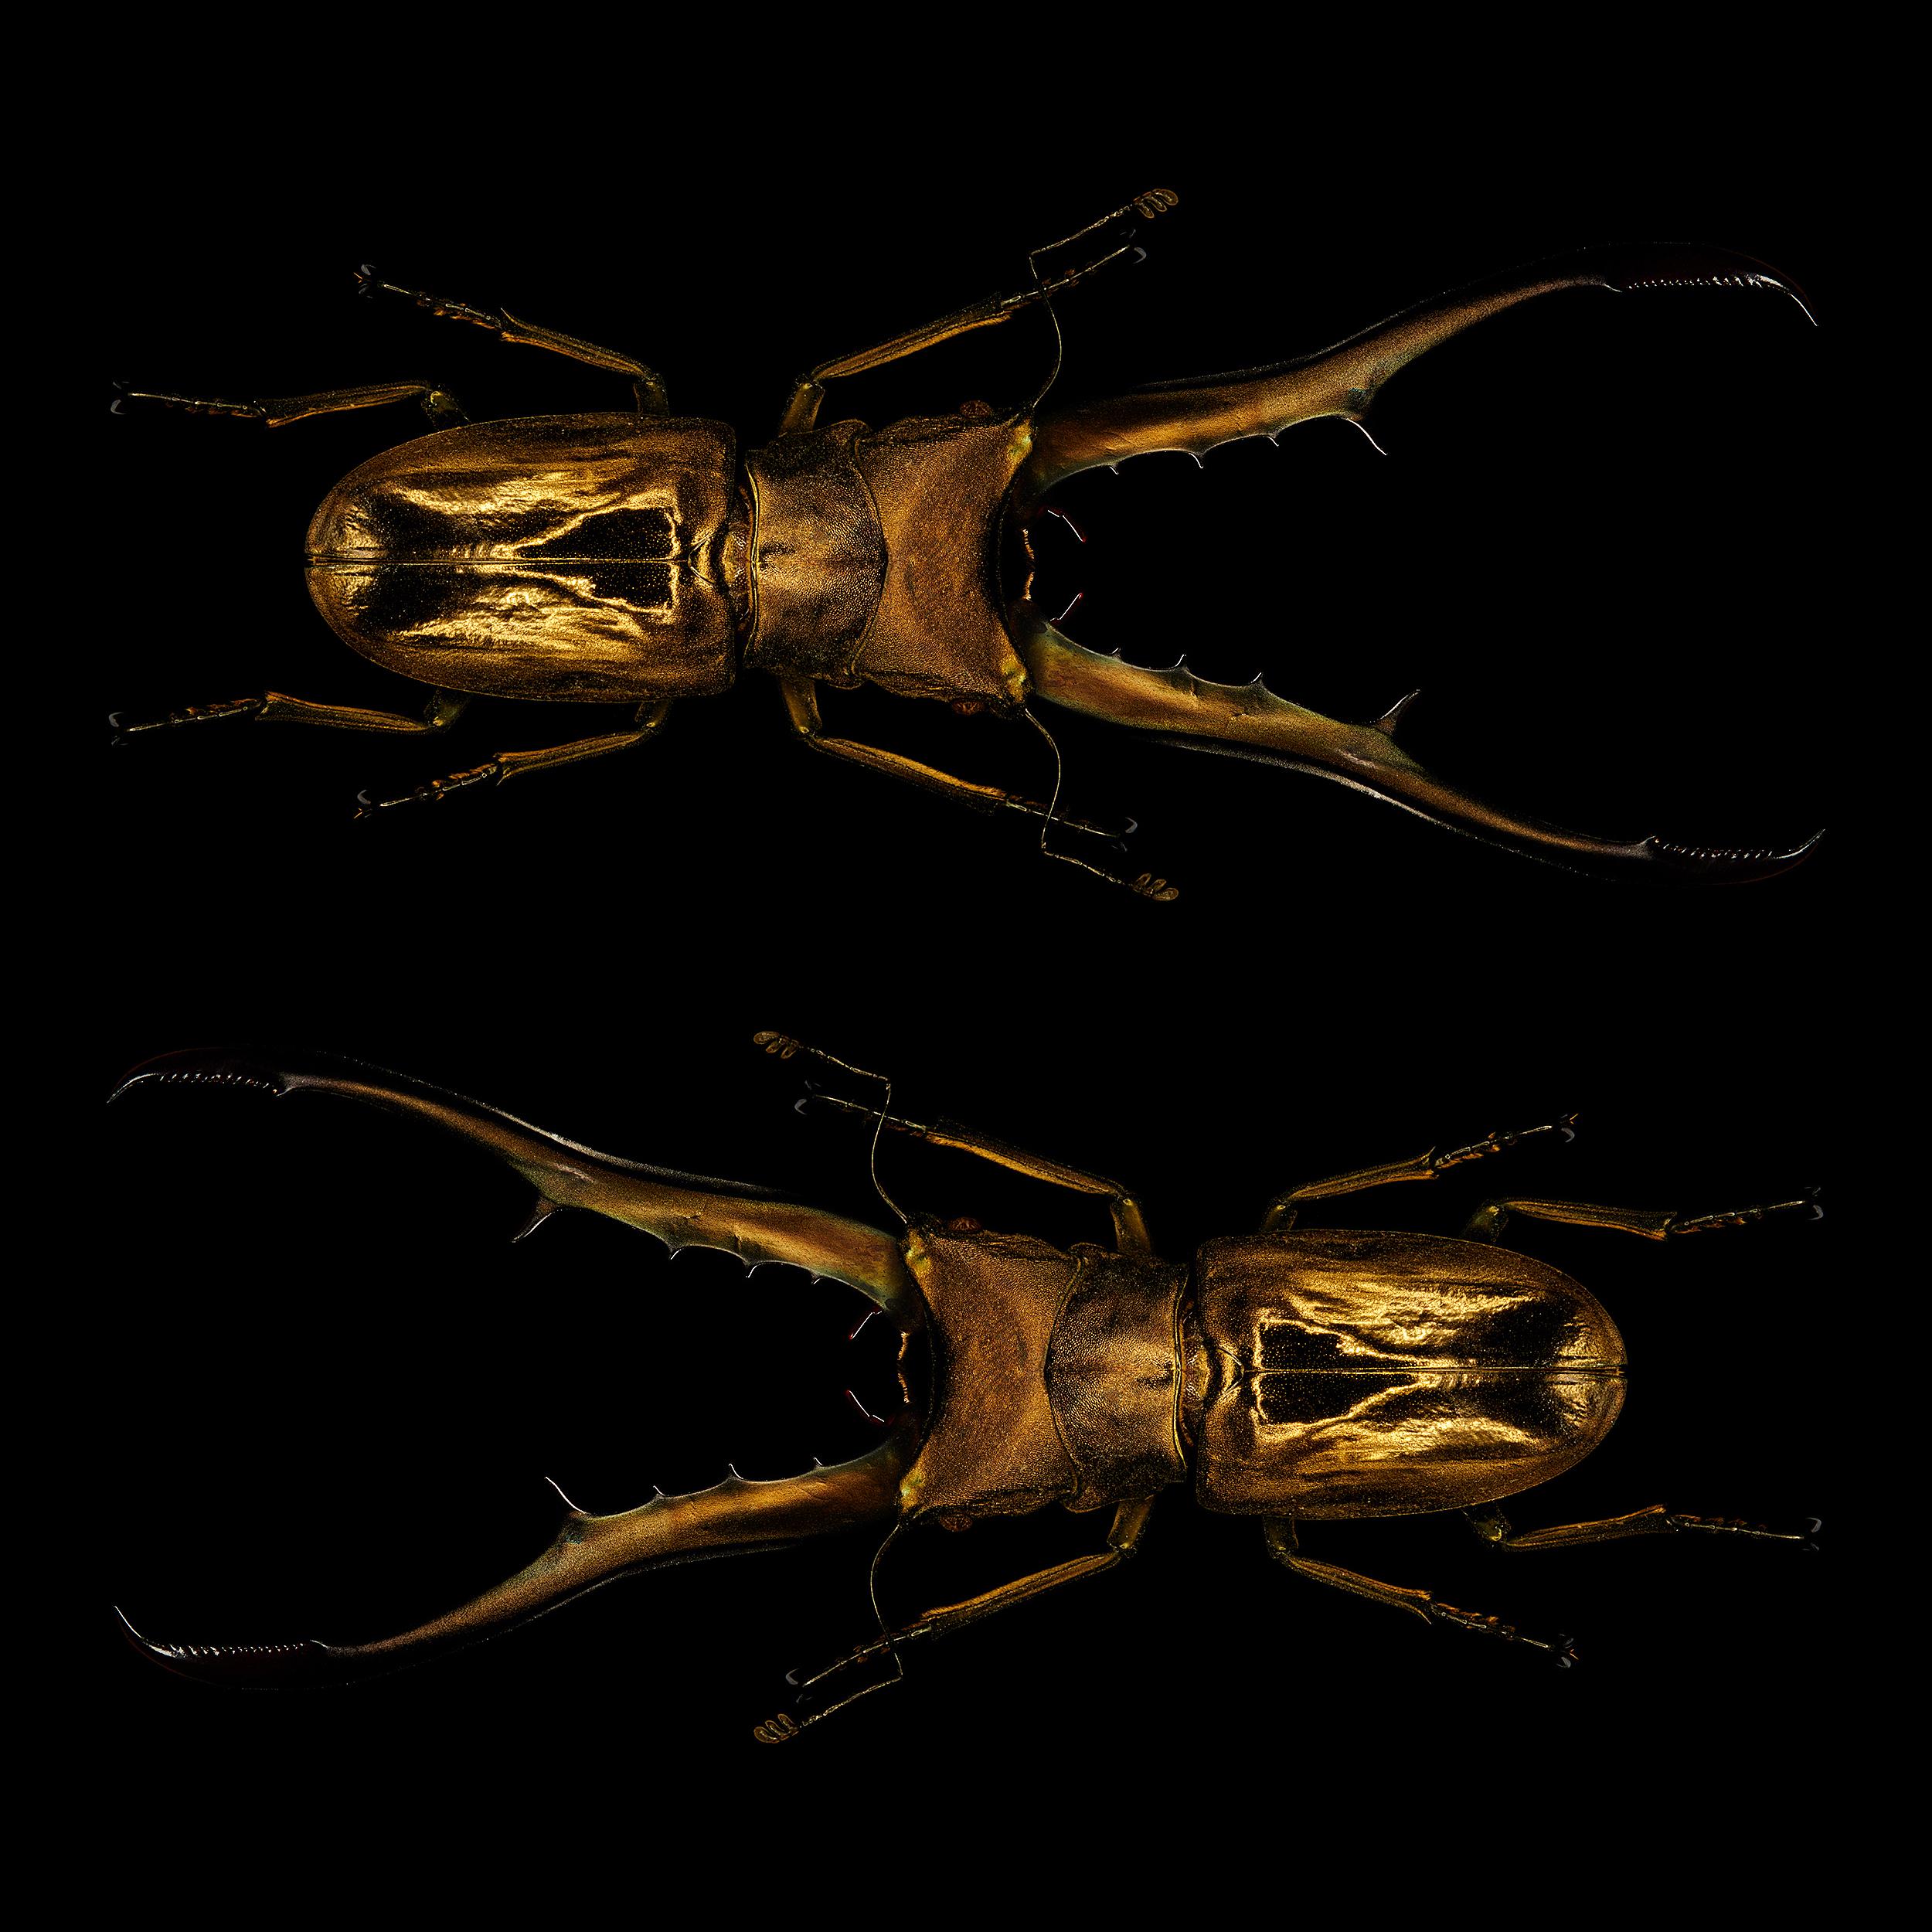 "<a href=""//mrsteel.london/shop/cyclommatus-metallifier-pair/"">REVEAL DETAILS / BUY</a>"